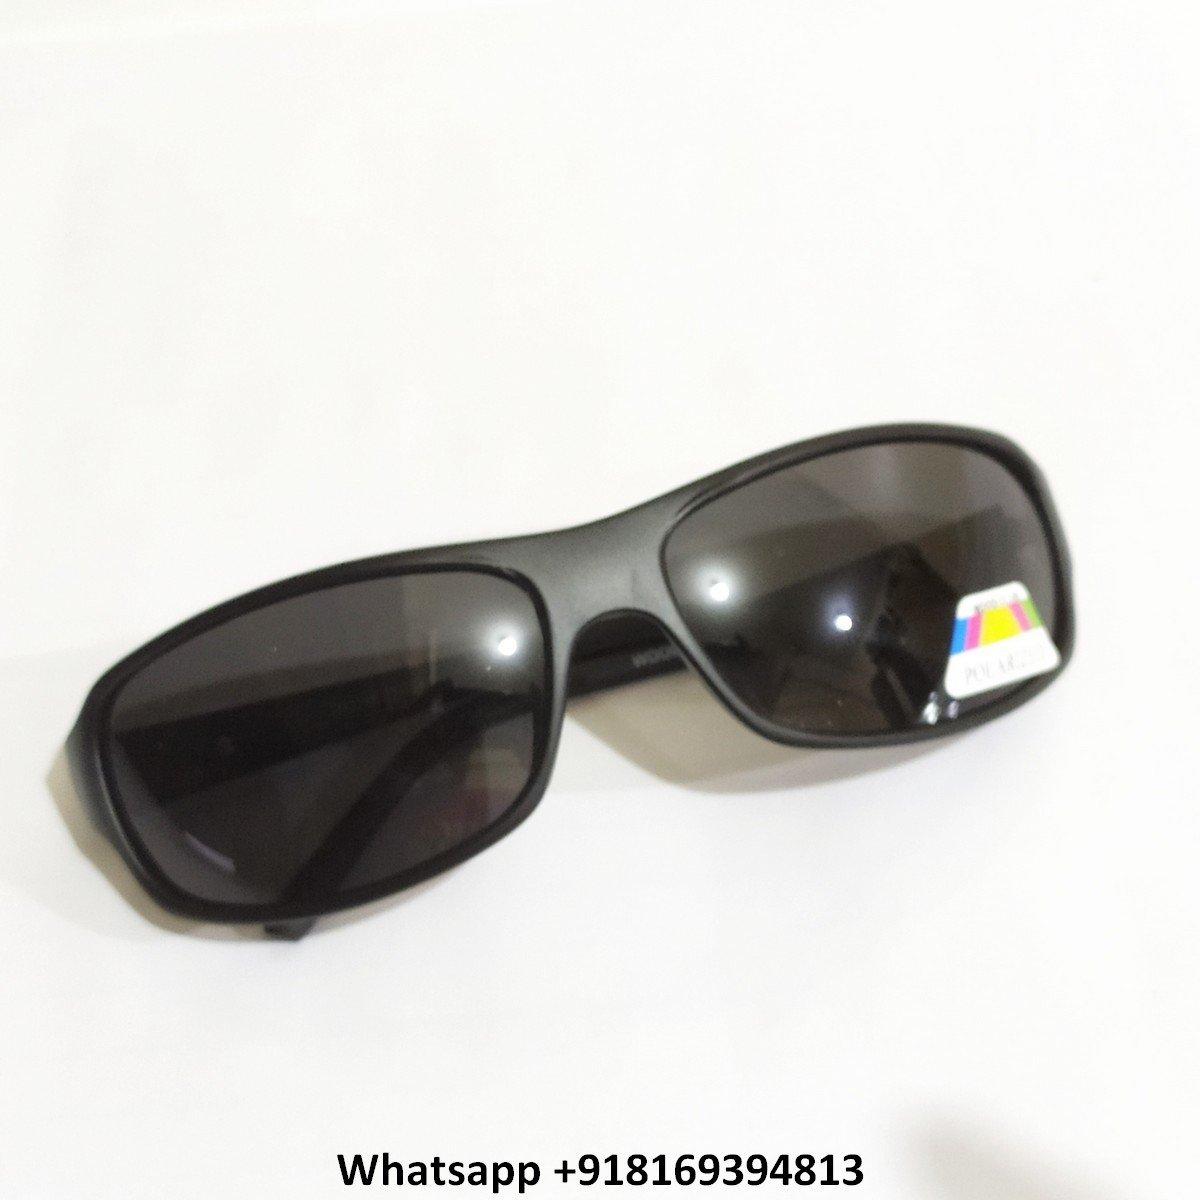 Wraparound Sports Polarized Sunglasses for Men and Women 10068MBK